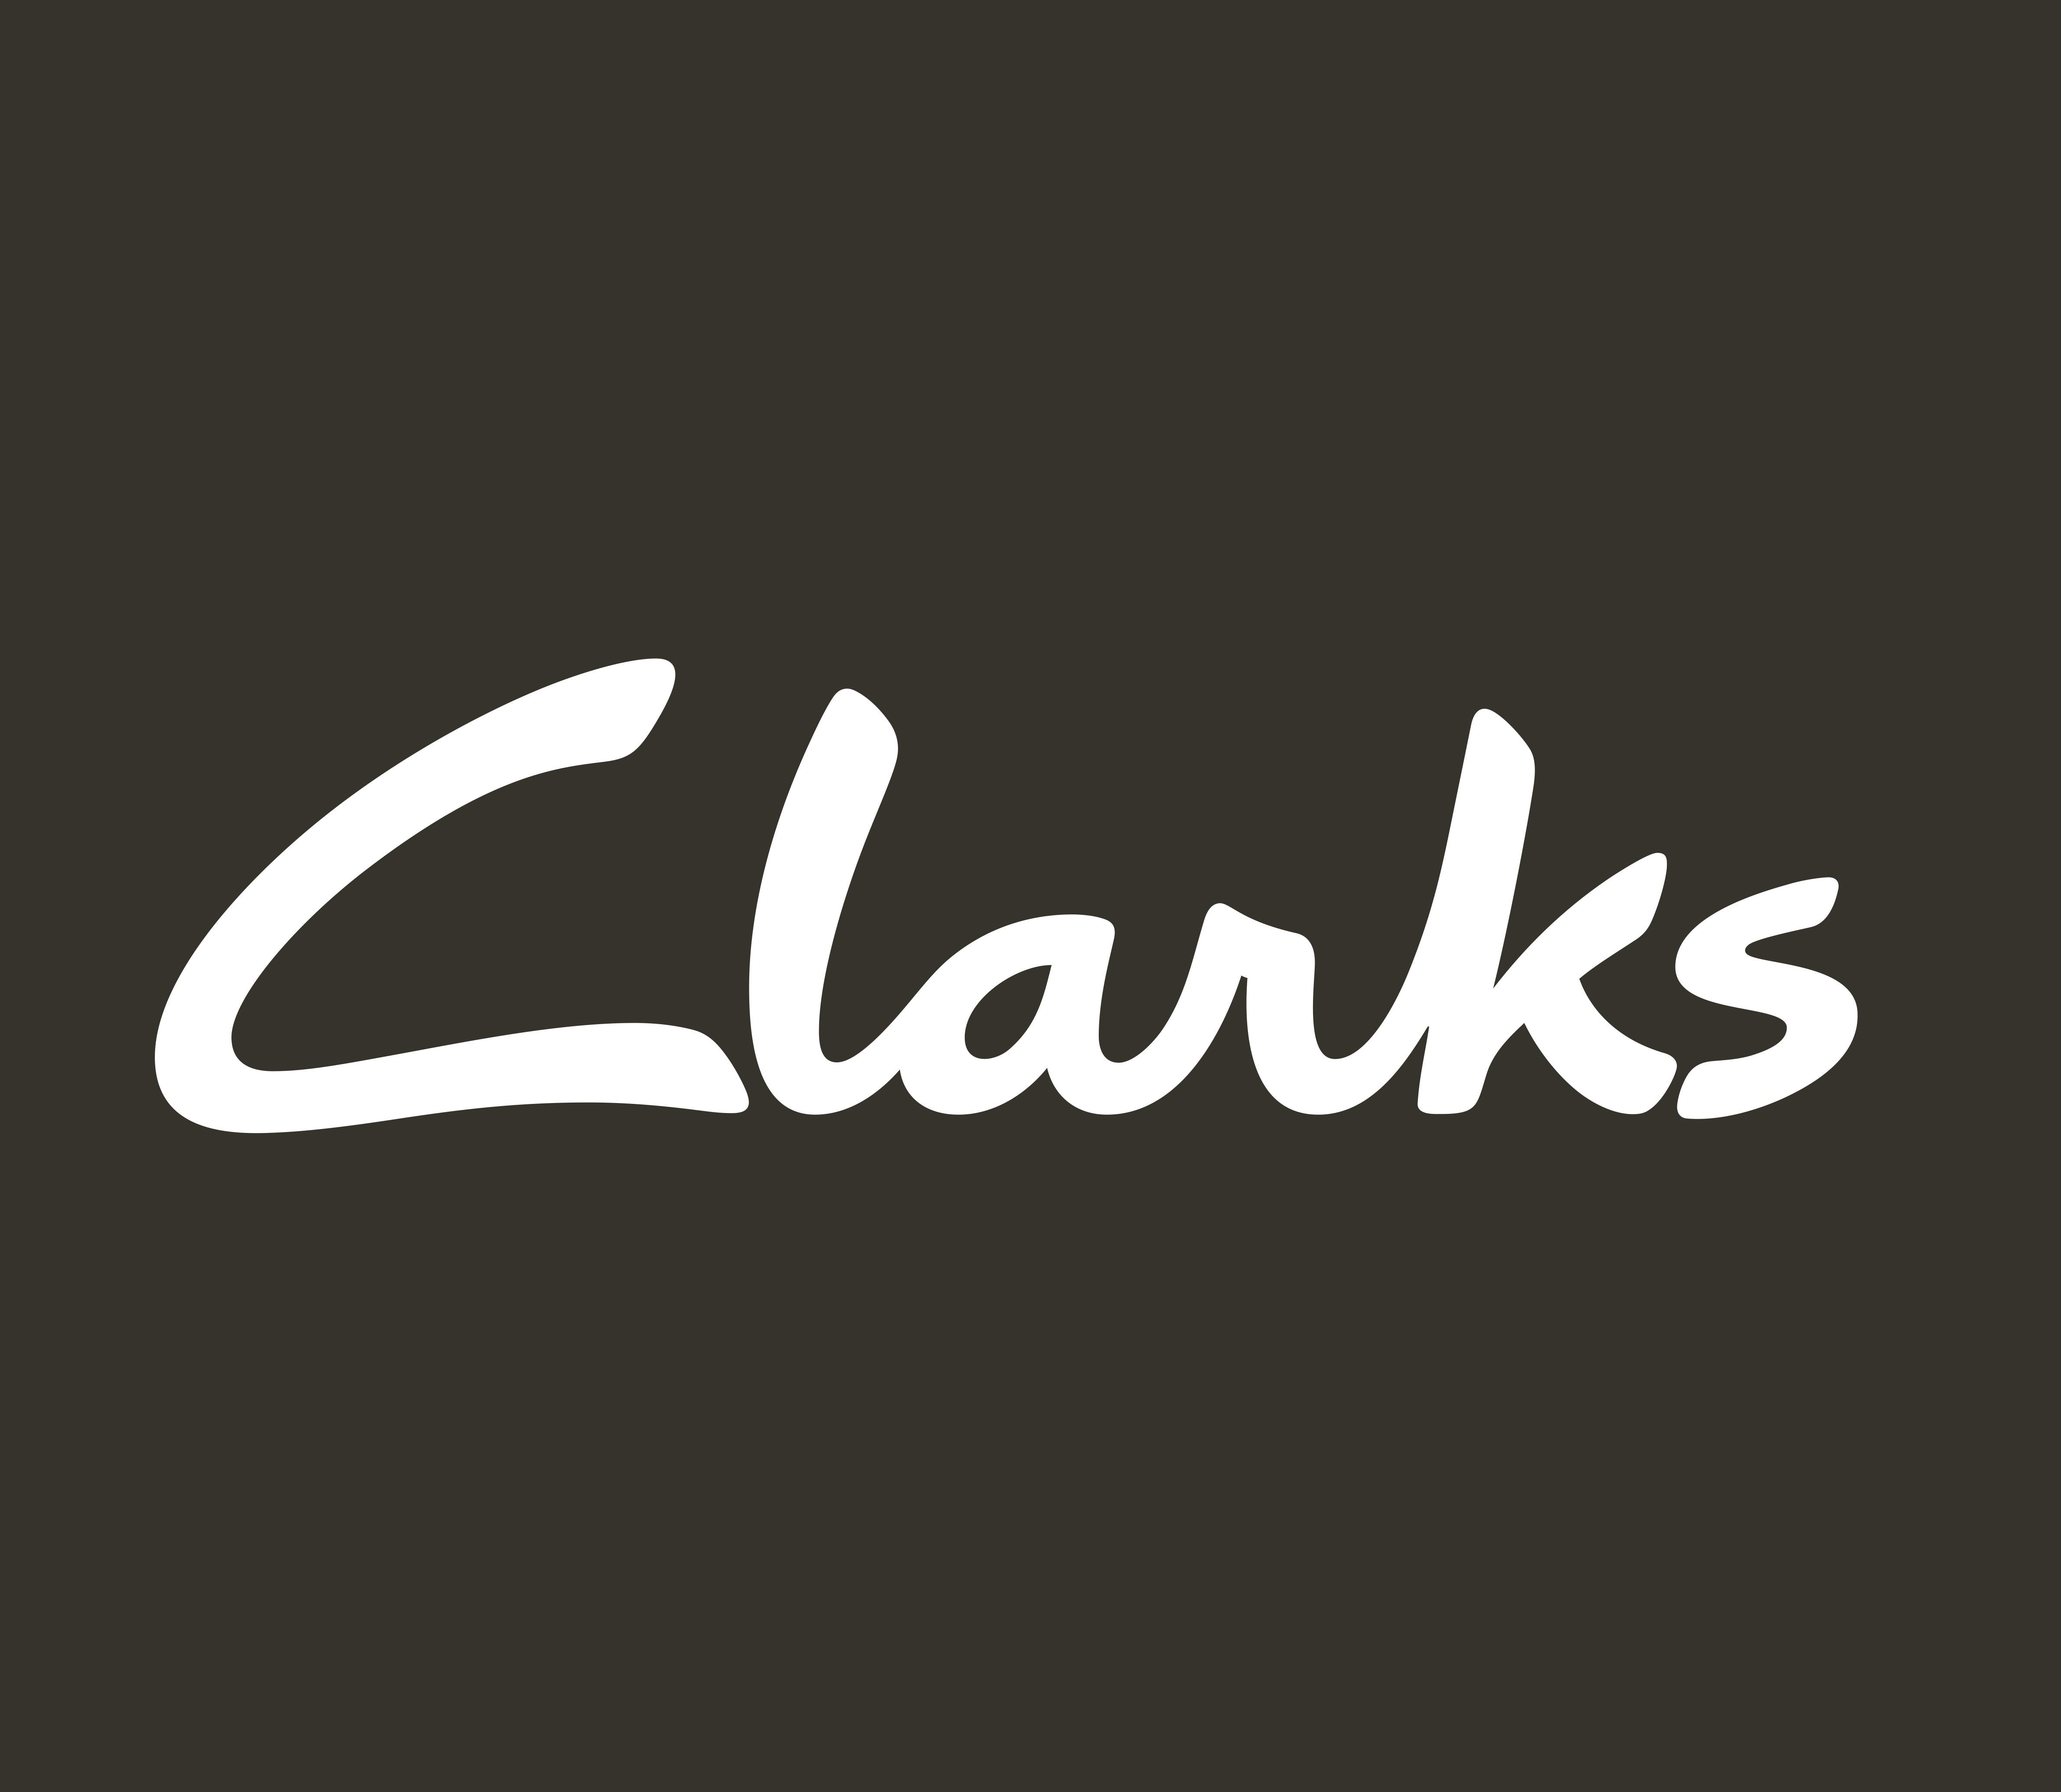 Bandeira Clarks Loja Nova Arcada 700x805